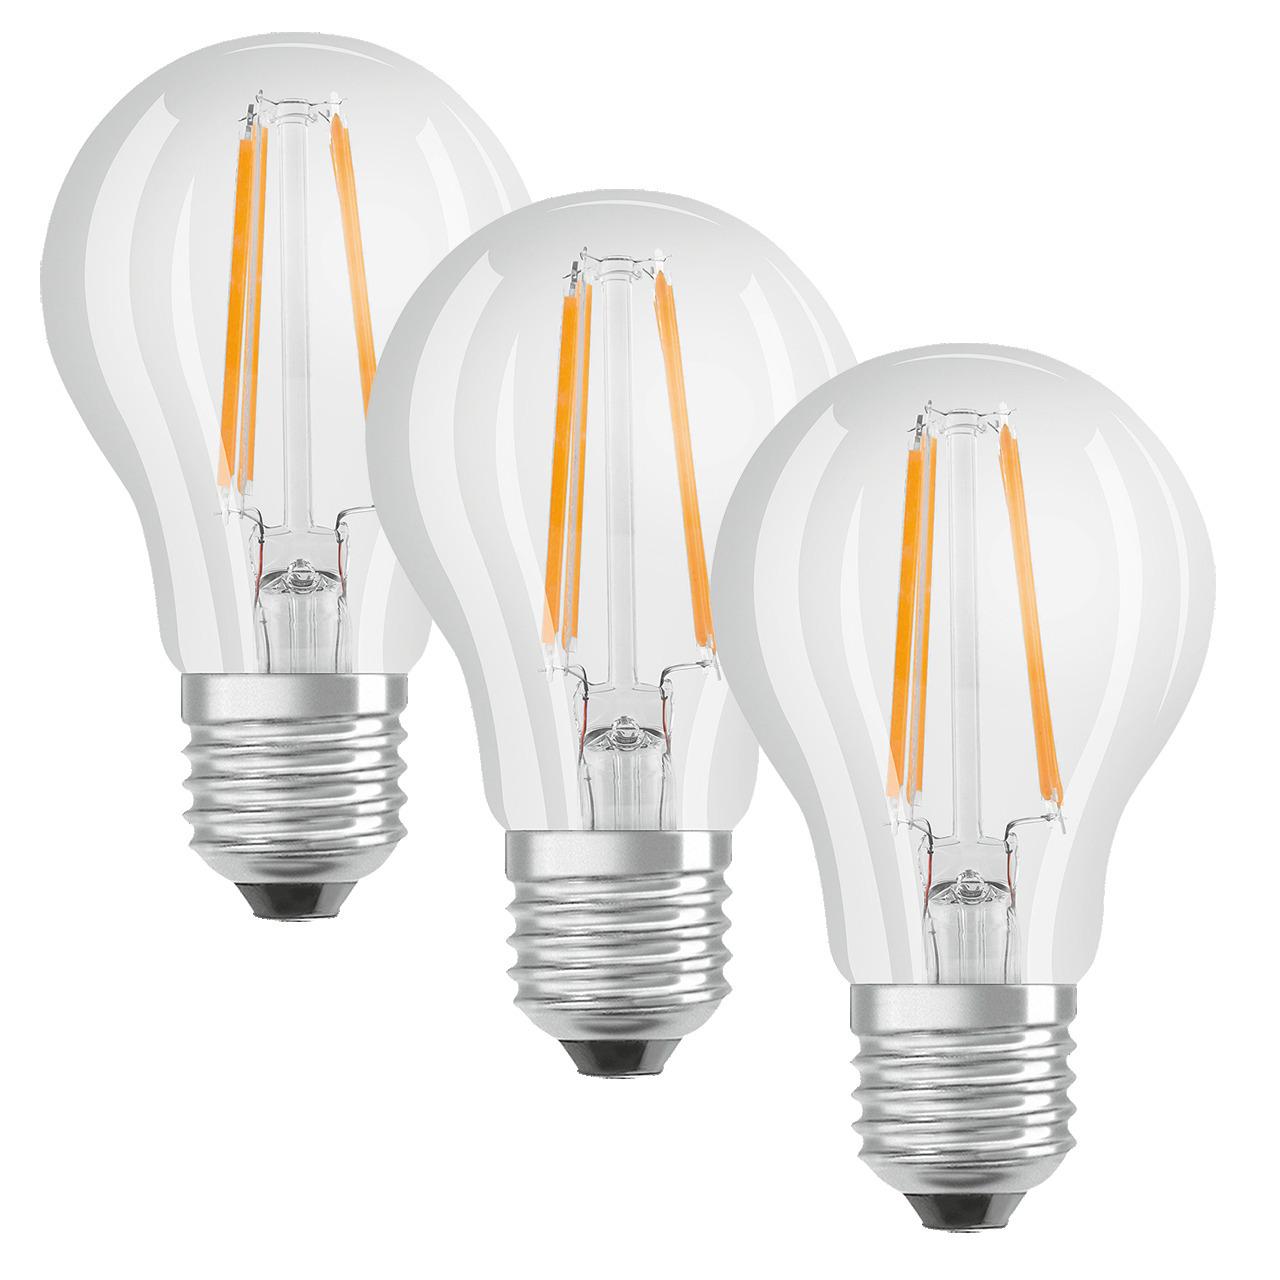 OSRAM LED PROMO 3er Set 7-W-Filament-LED-Lampe E27- warmweiss- klar